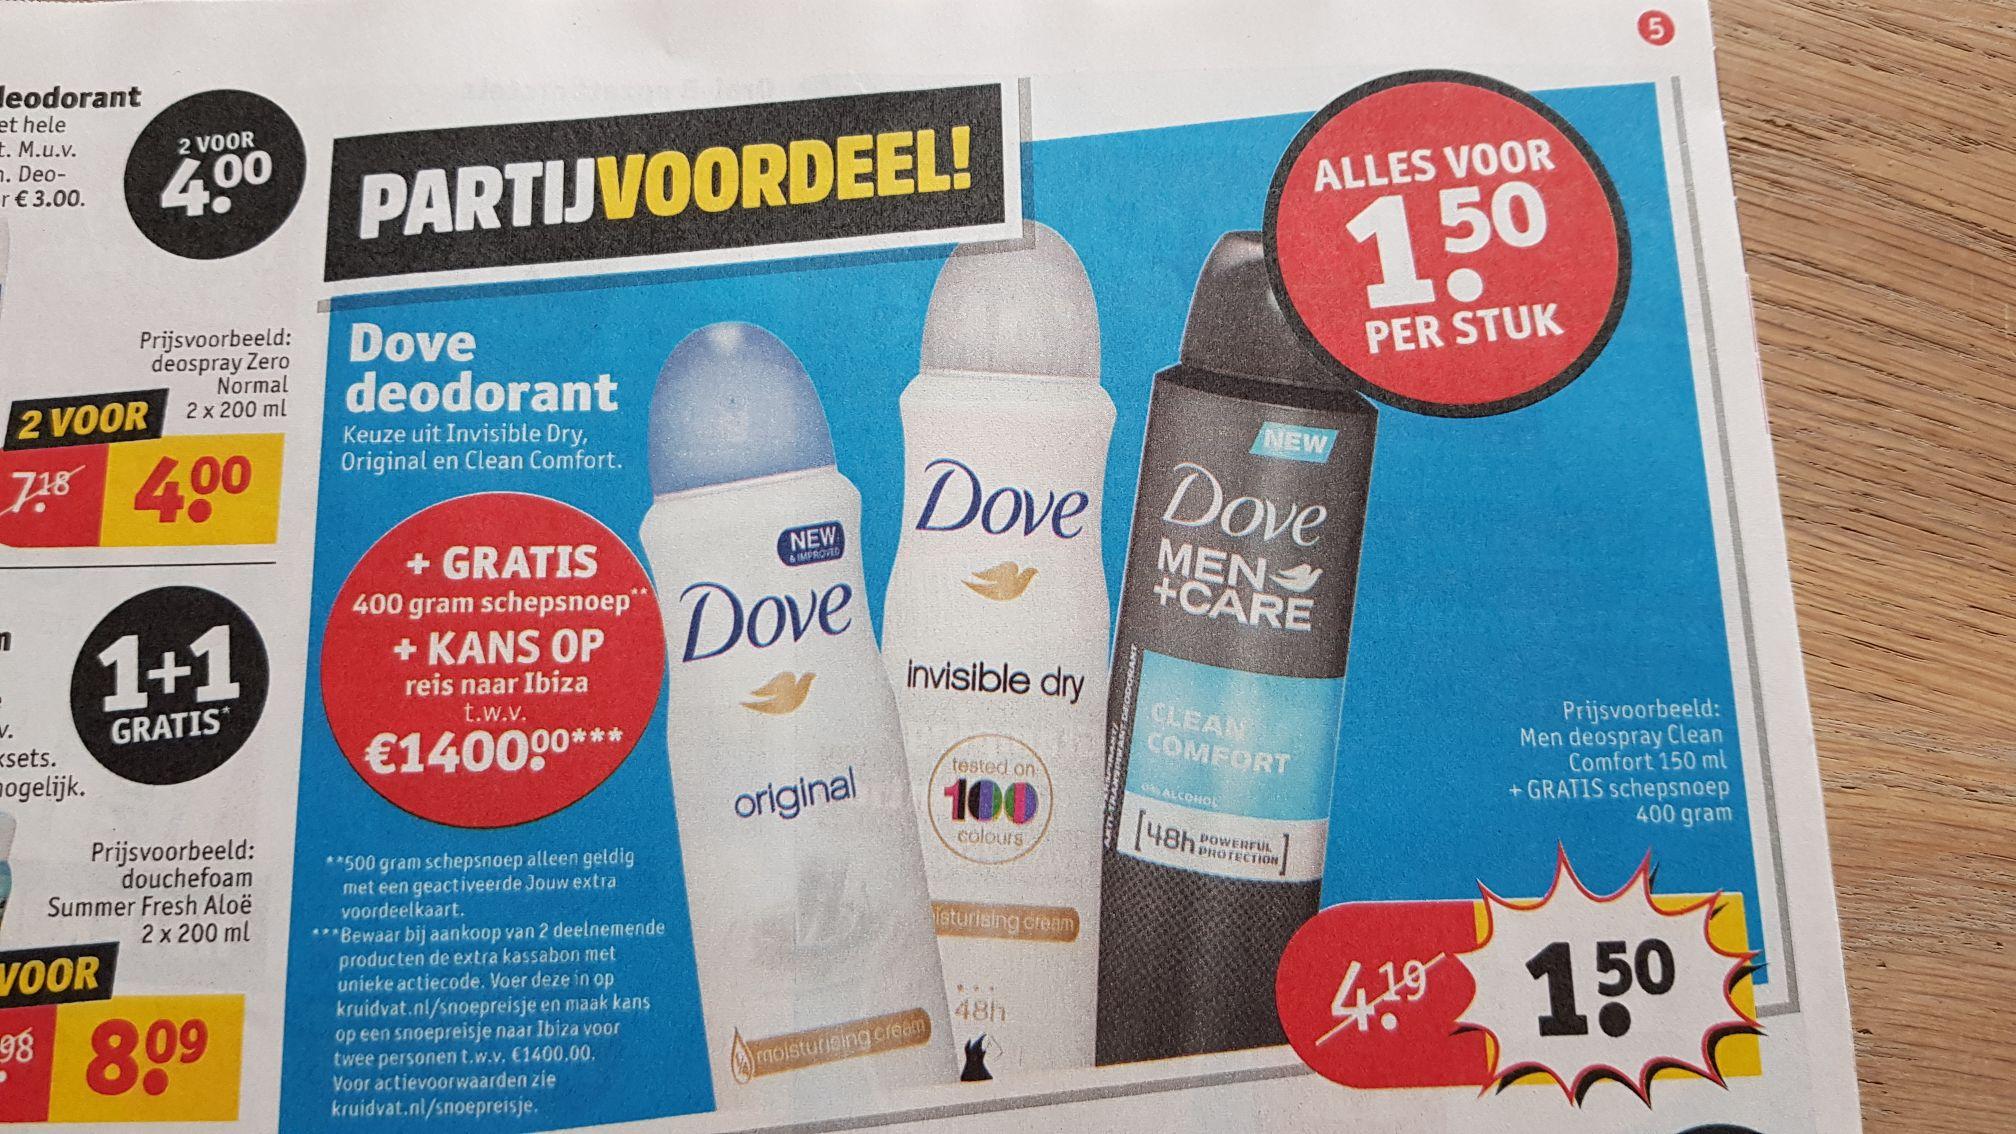 Kruidvat: Dove deodorant €1,50 per stuk. Bij 2 stuks 400/500 gram schepsnoep.